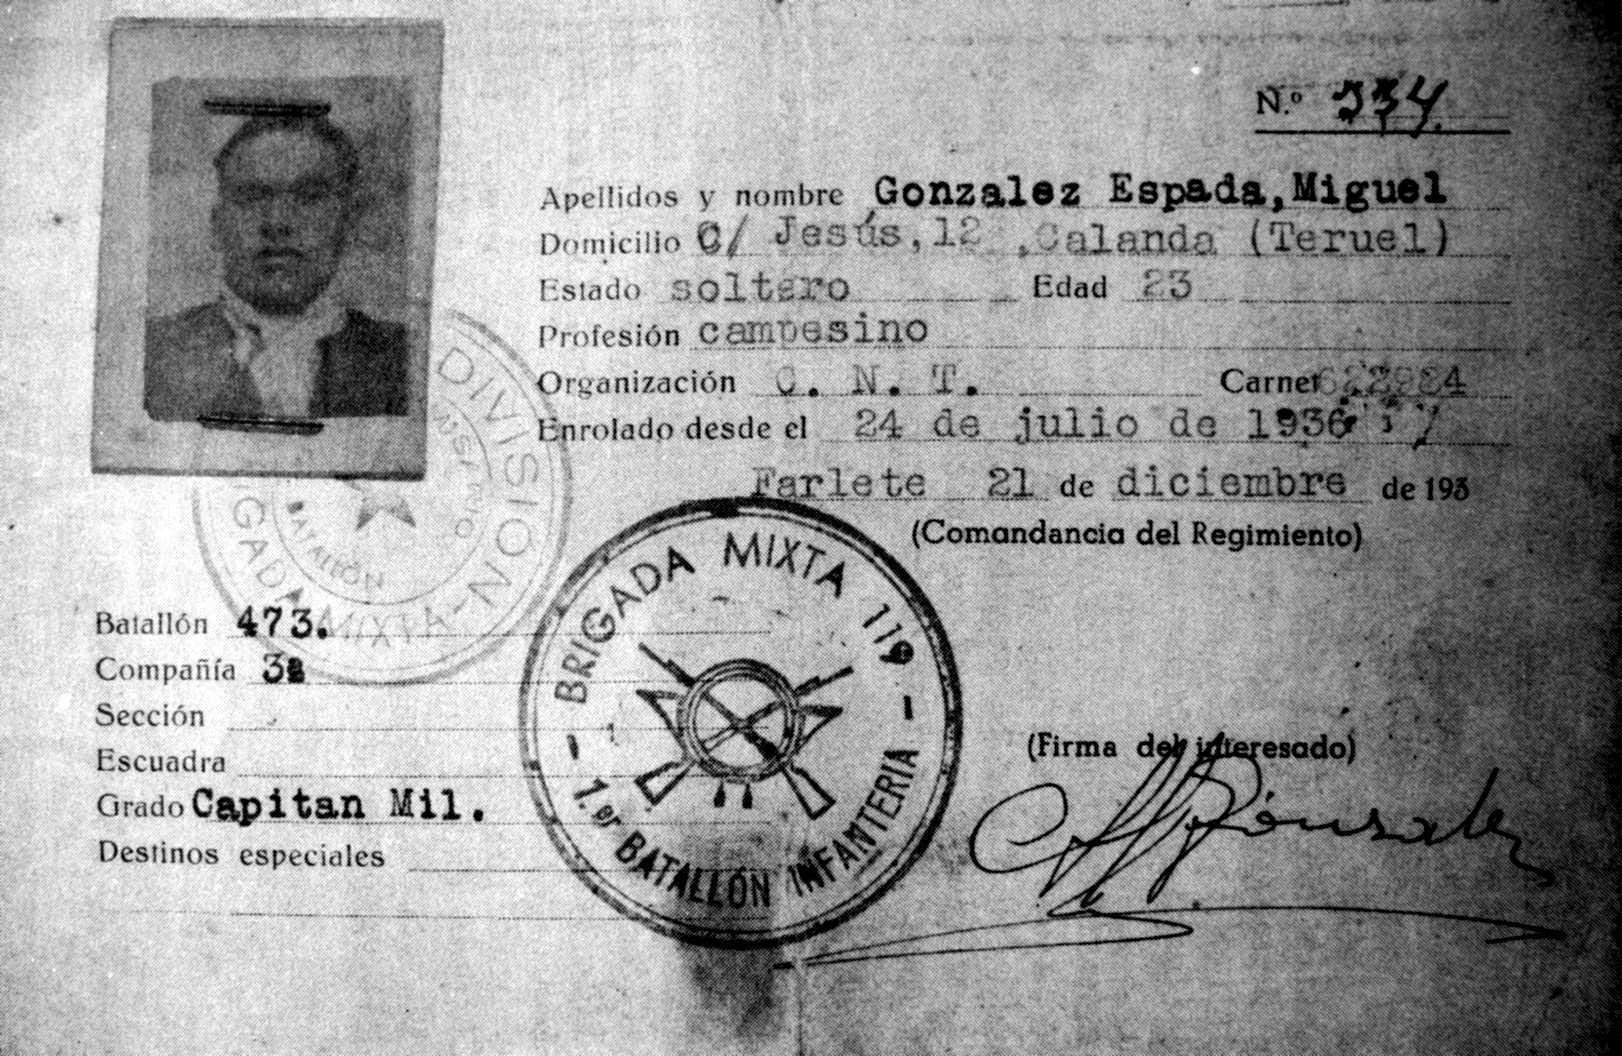 Carnet militar de Miguel González Espada